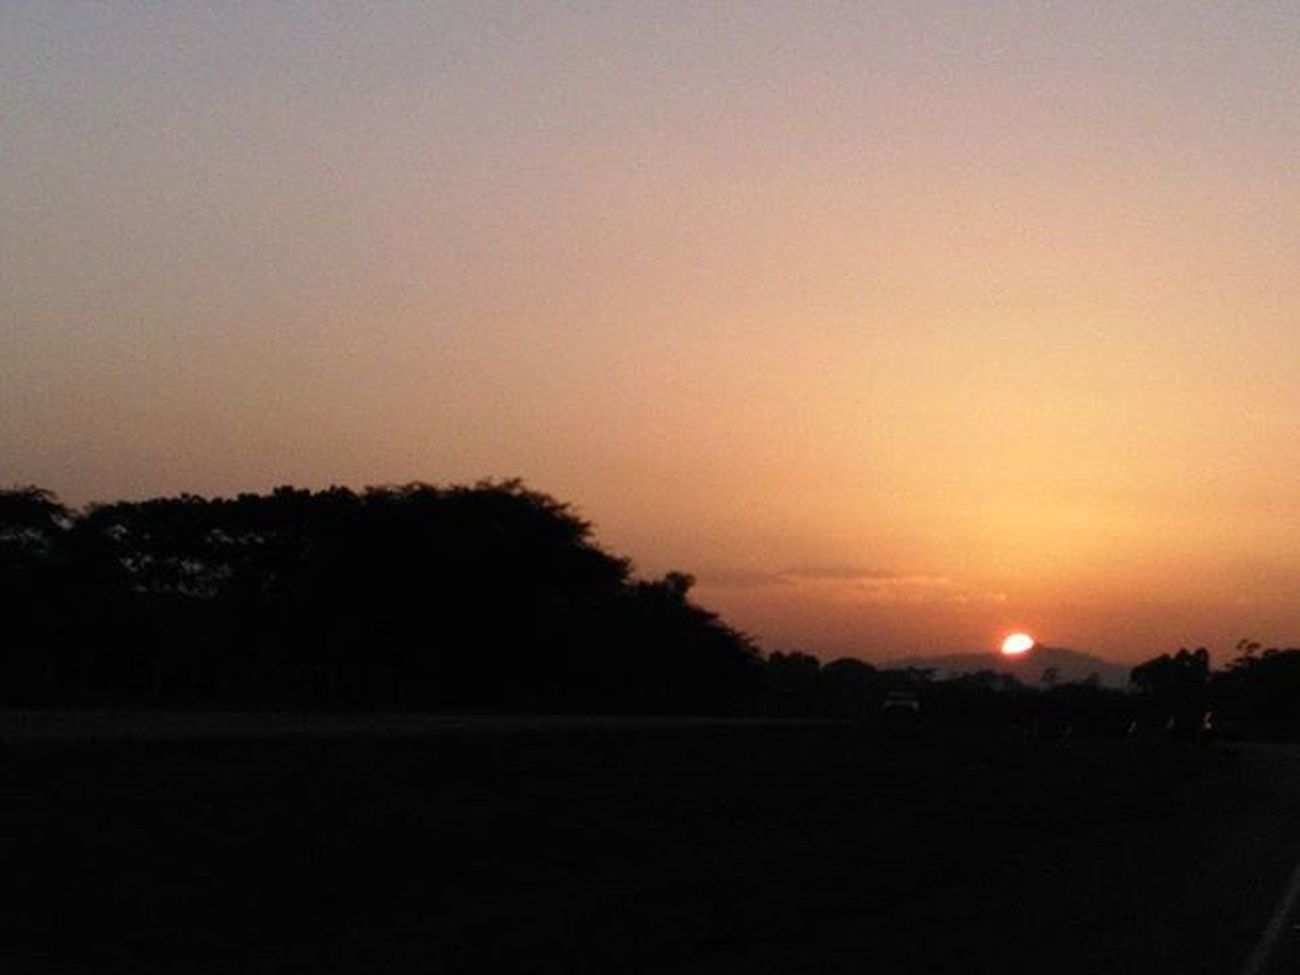 Se apaga el día y yo sigo pensándote... Sunset Venezuela Higue Micorazonenunamaleta MonCouerDansUneValise Photographer Amateur PhotoYoshy